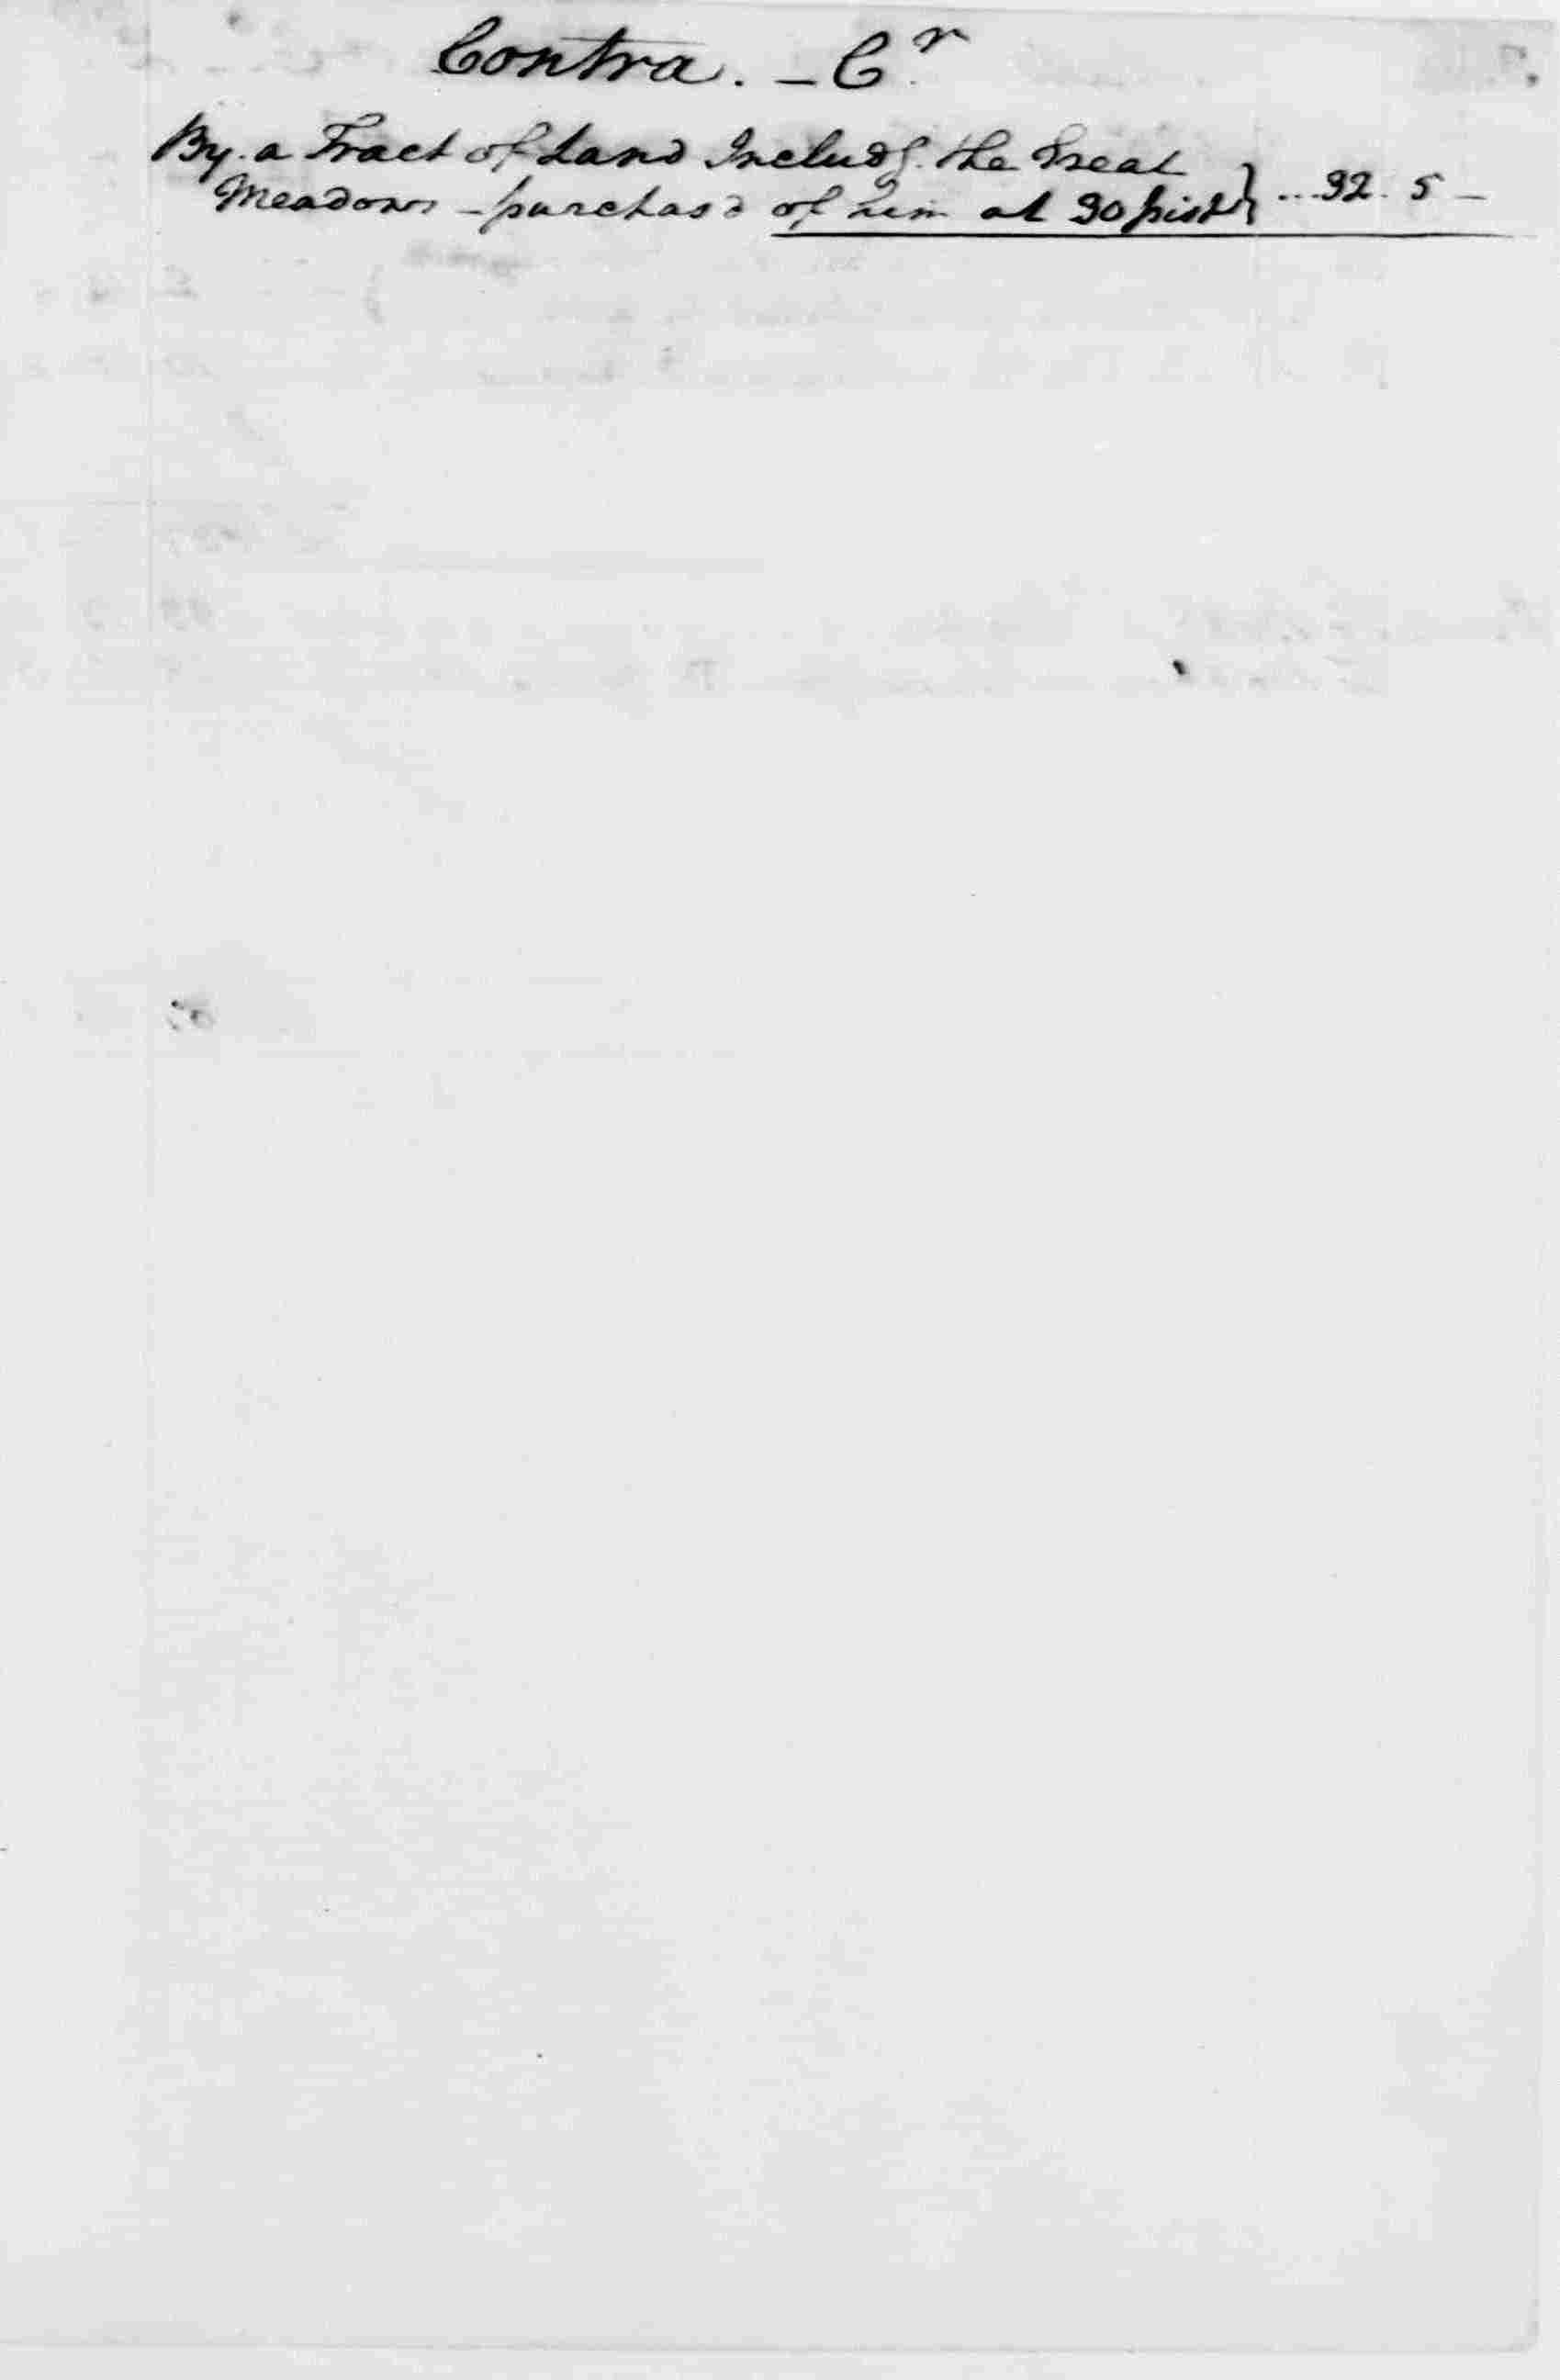 Ledger A, folio 348, right side